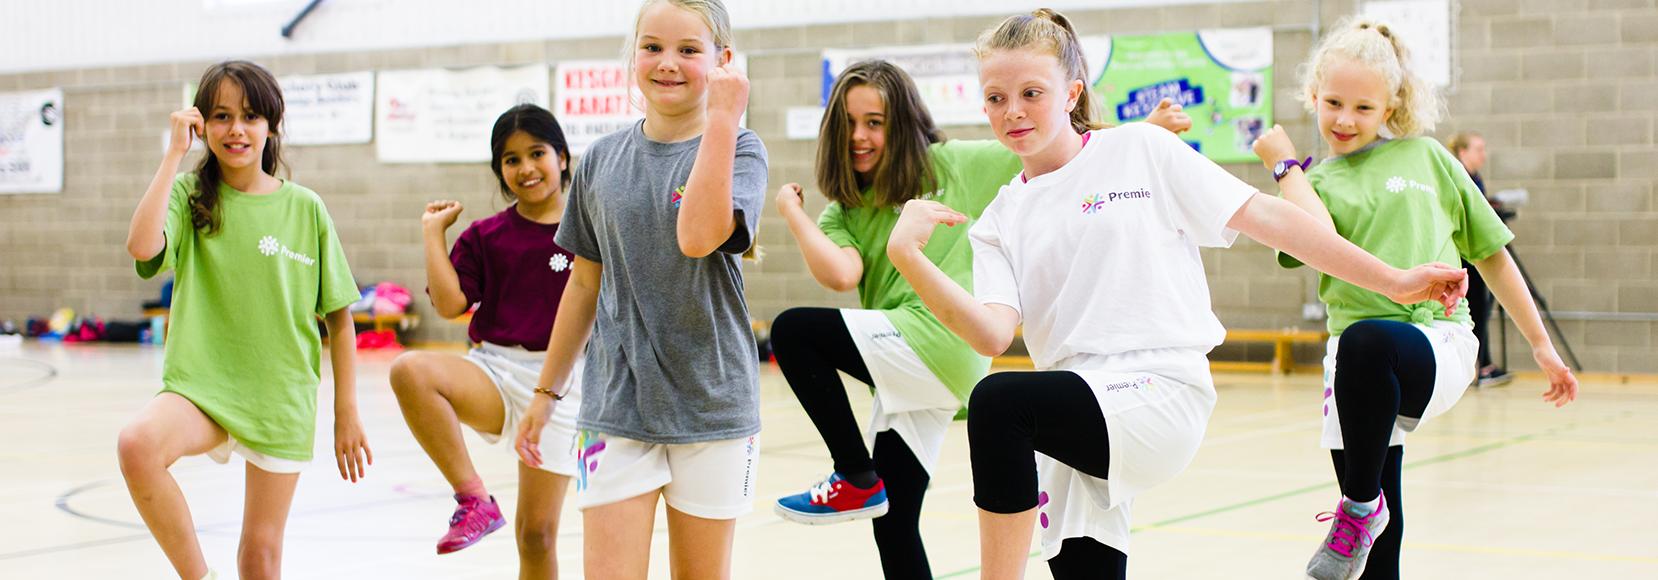 Street Dance girls smiling 1658x580 1